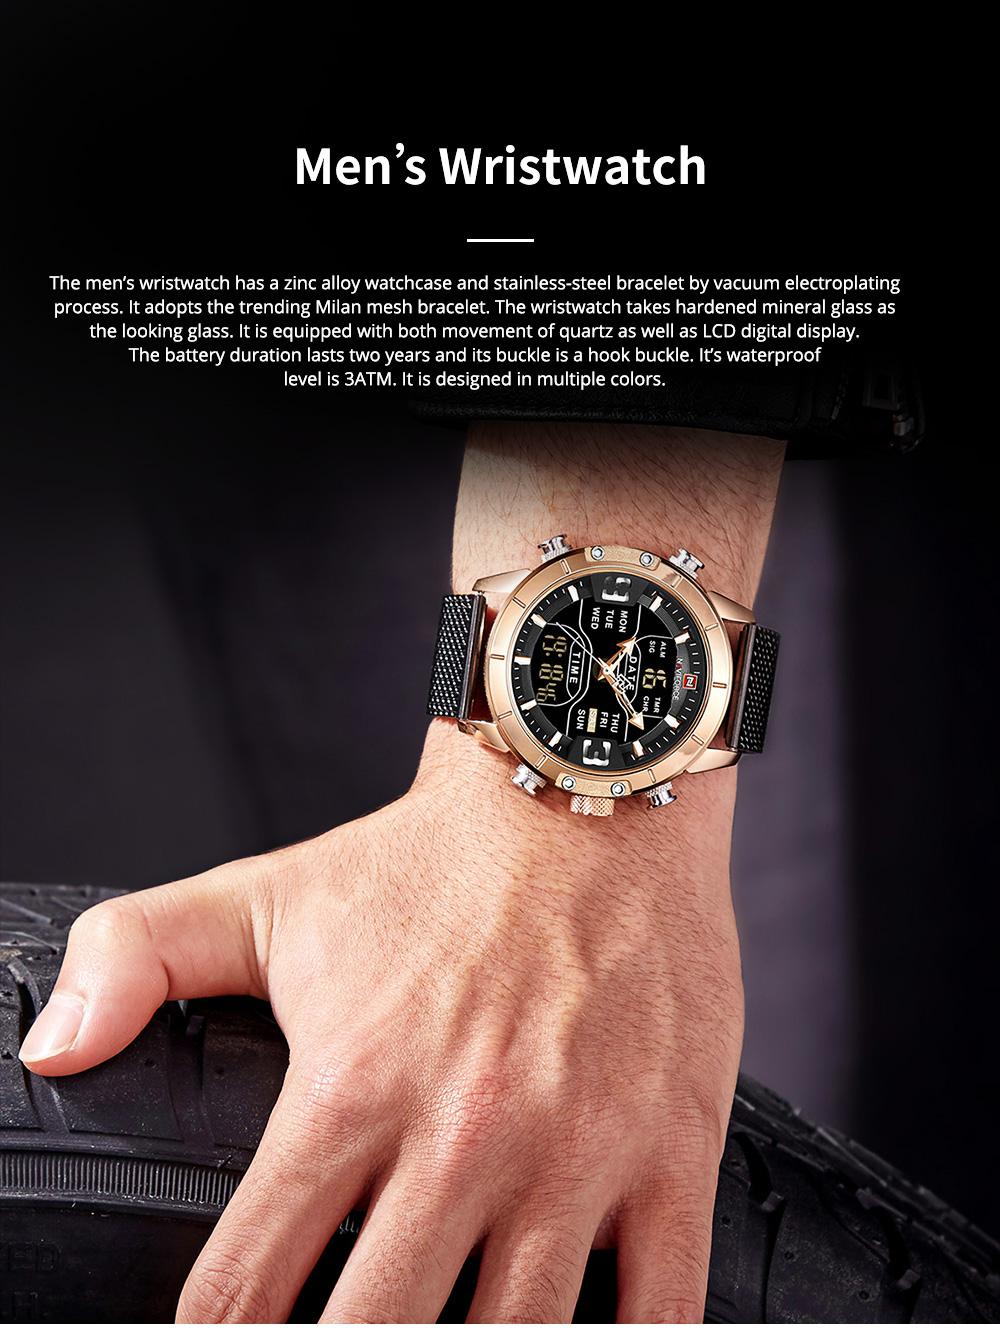 Fashionable Casual Men's Wristwatch with Stainless-steel Bracelet Waterproof Dual Display Movement Luminous Hand Quartz Sport Watch 0